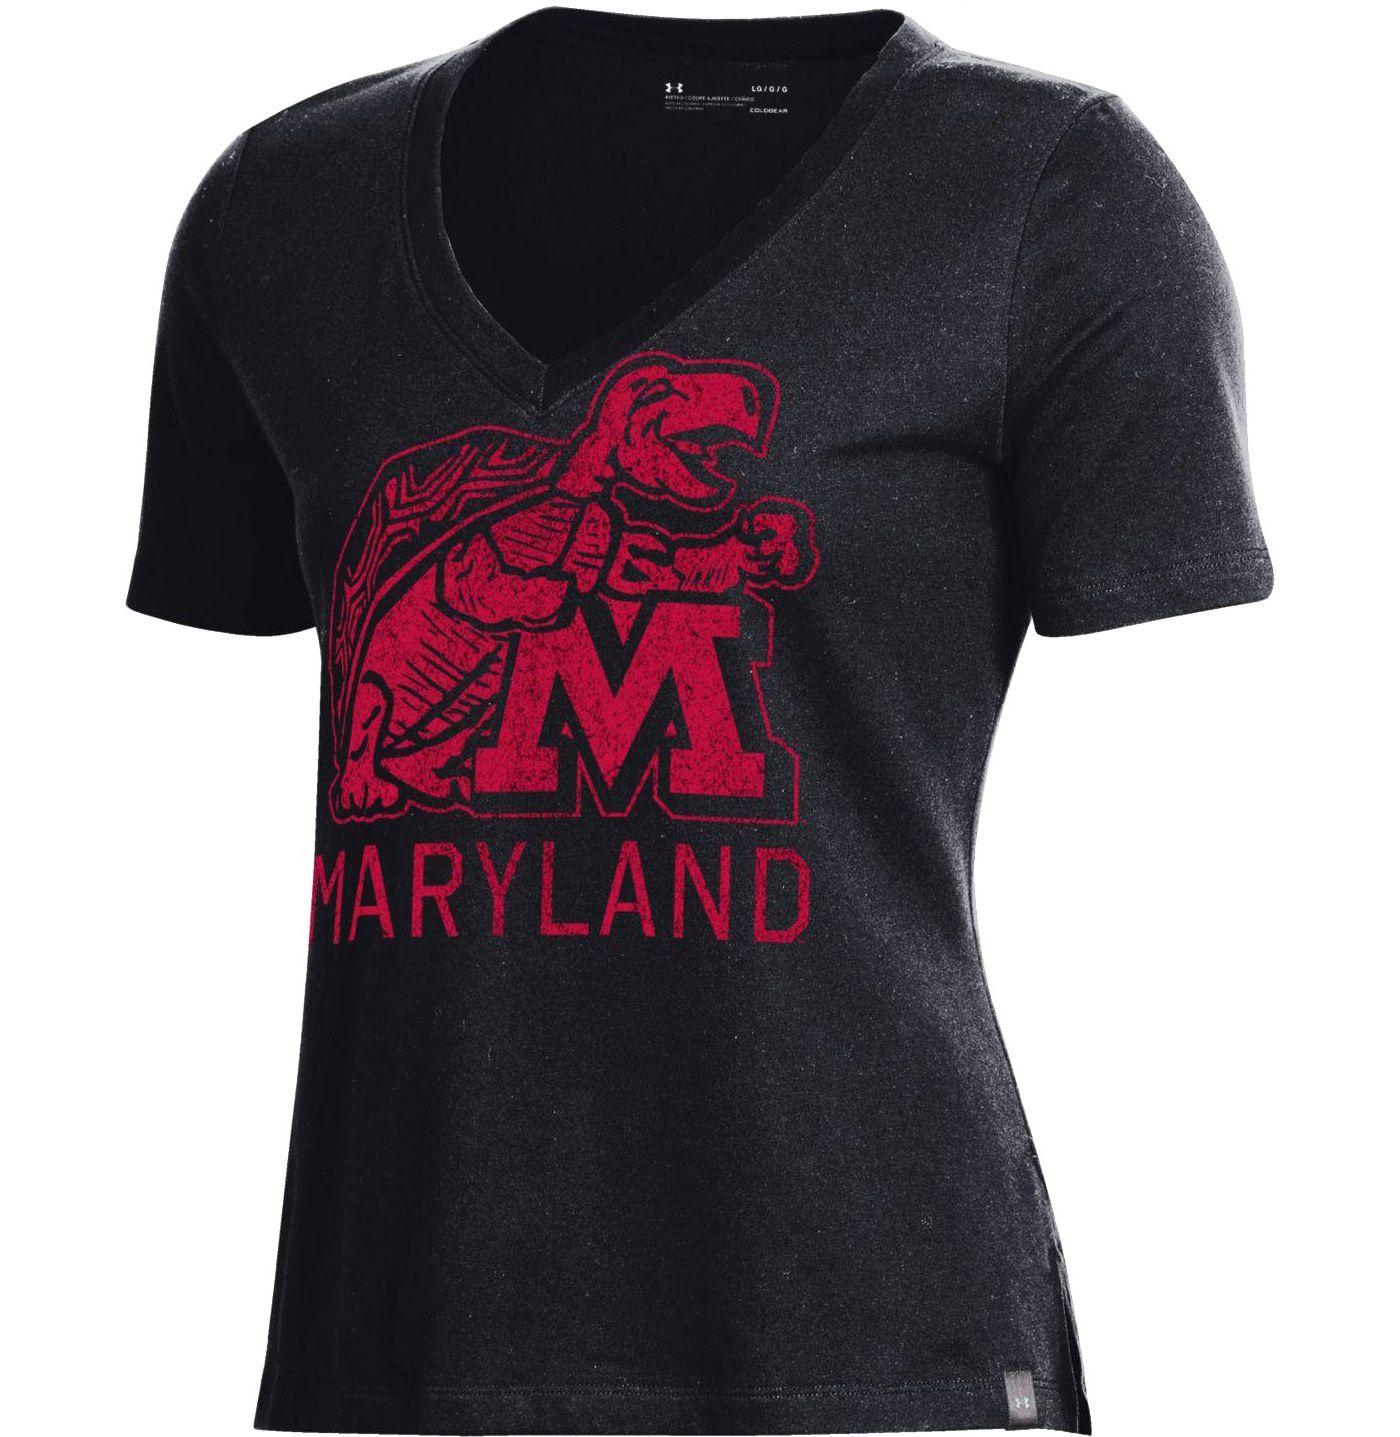 Under Armour Women's Maryland Terrapins Performance V-Neck Black T-Shirt